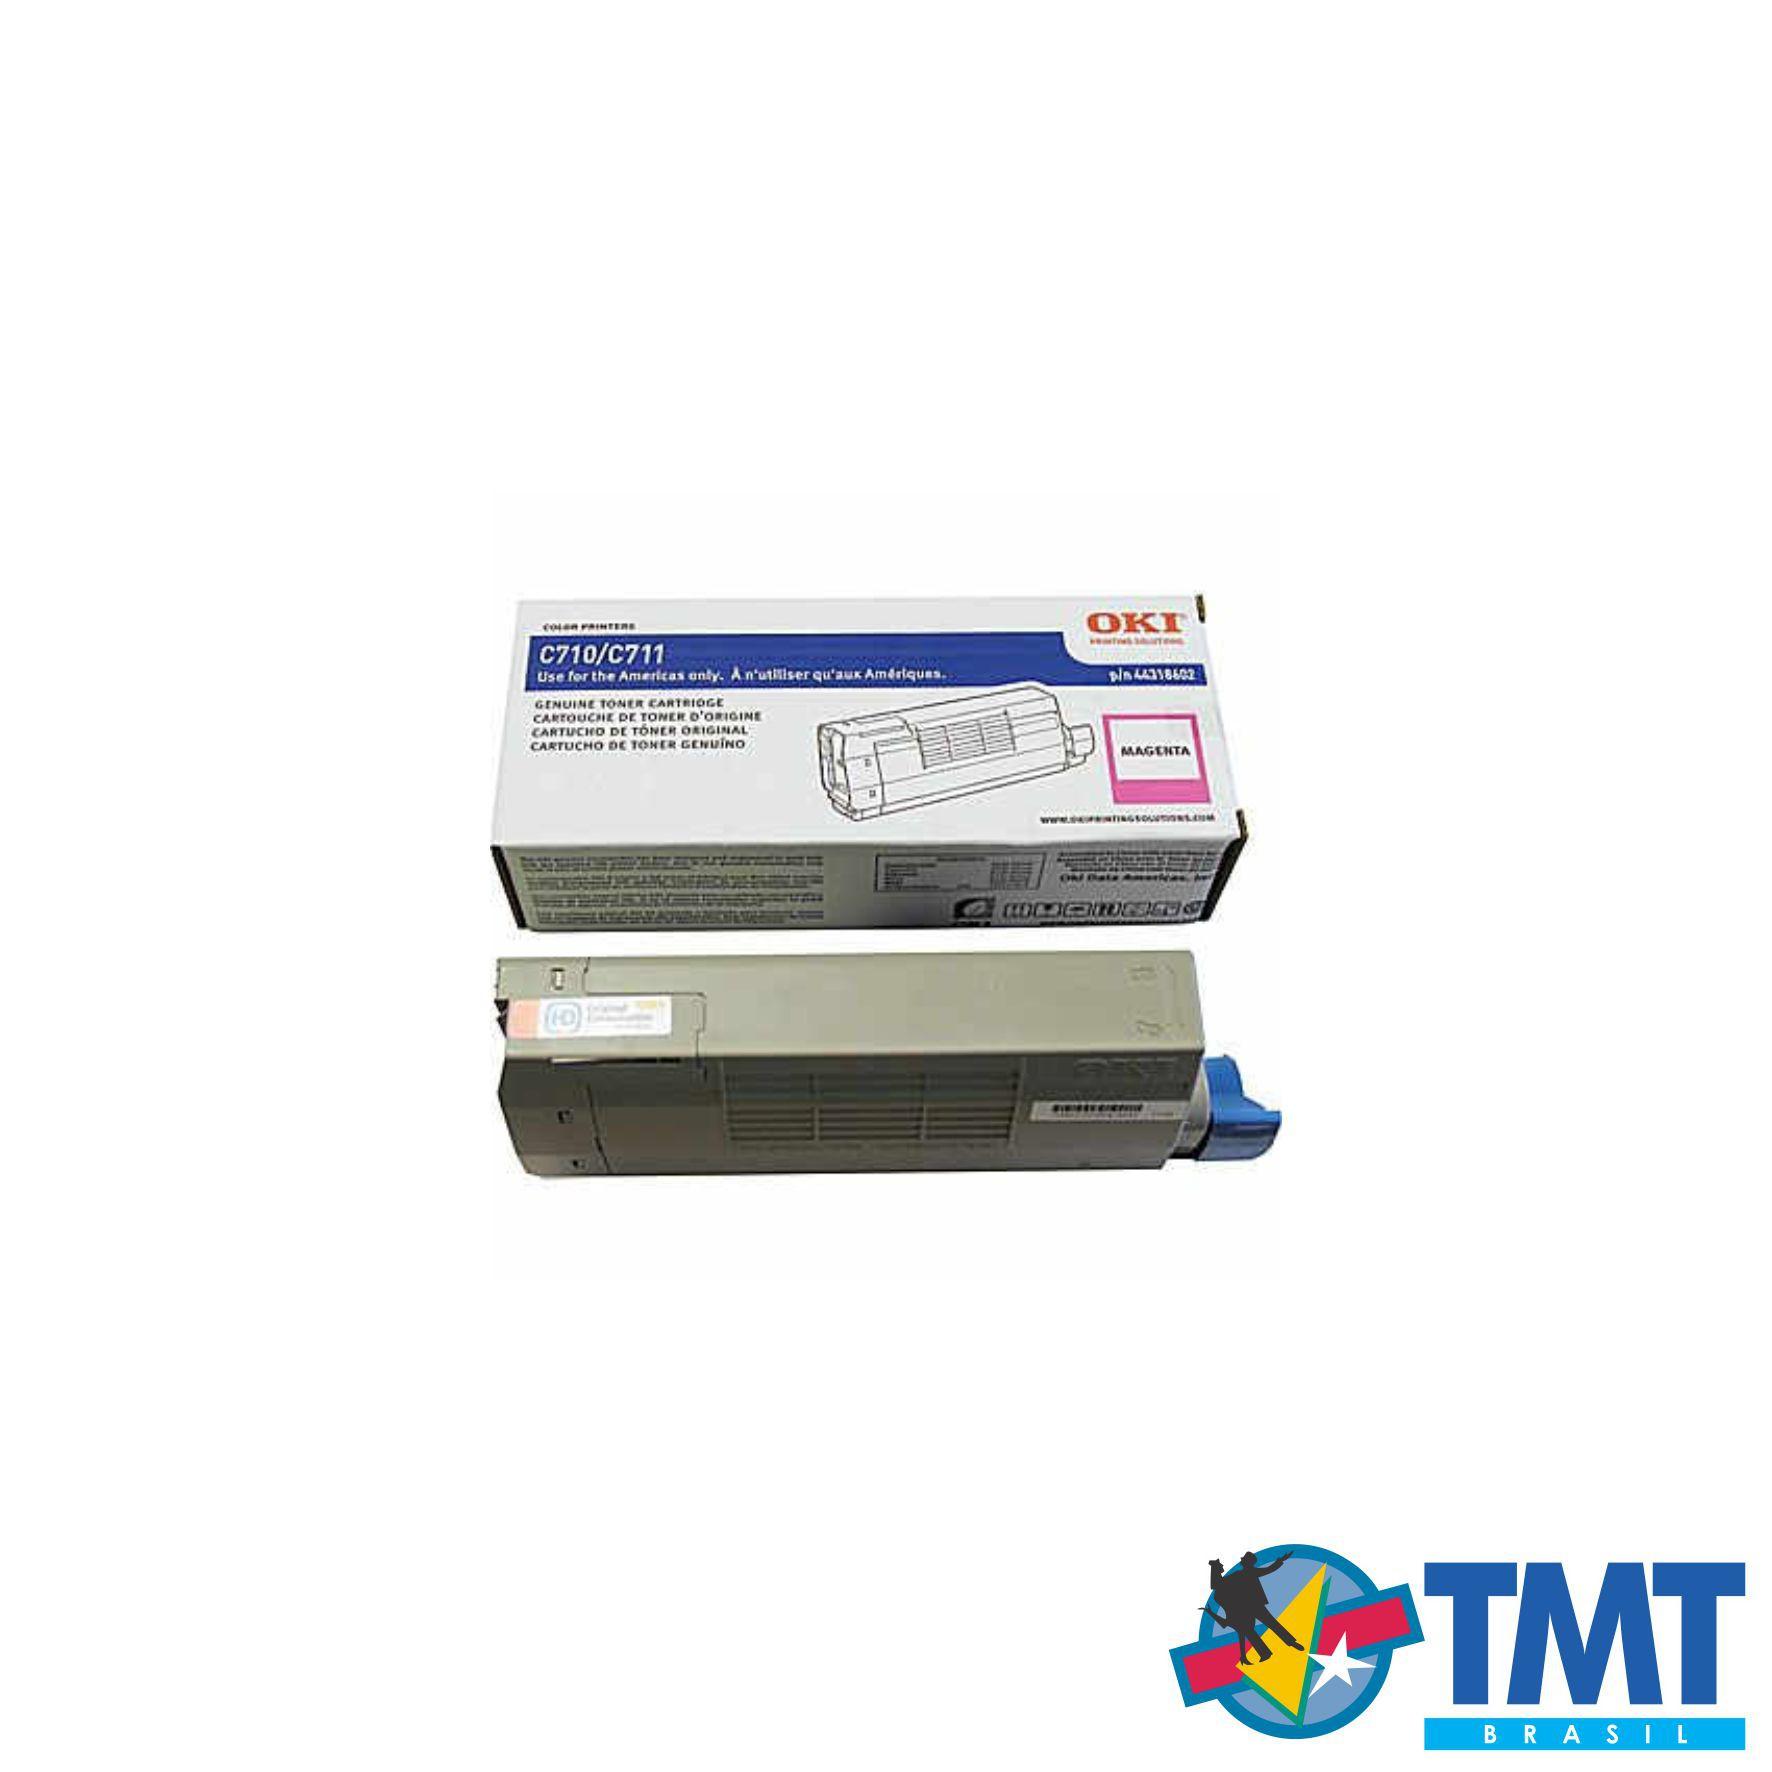 Cartucho de Toner Magenta OKI C711 - Alta Capacidade